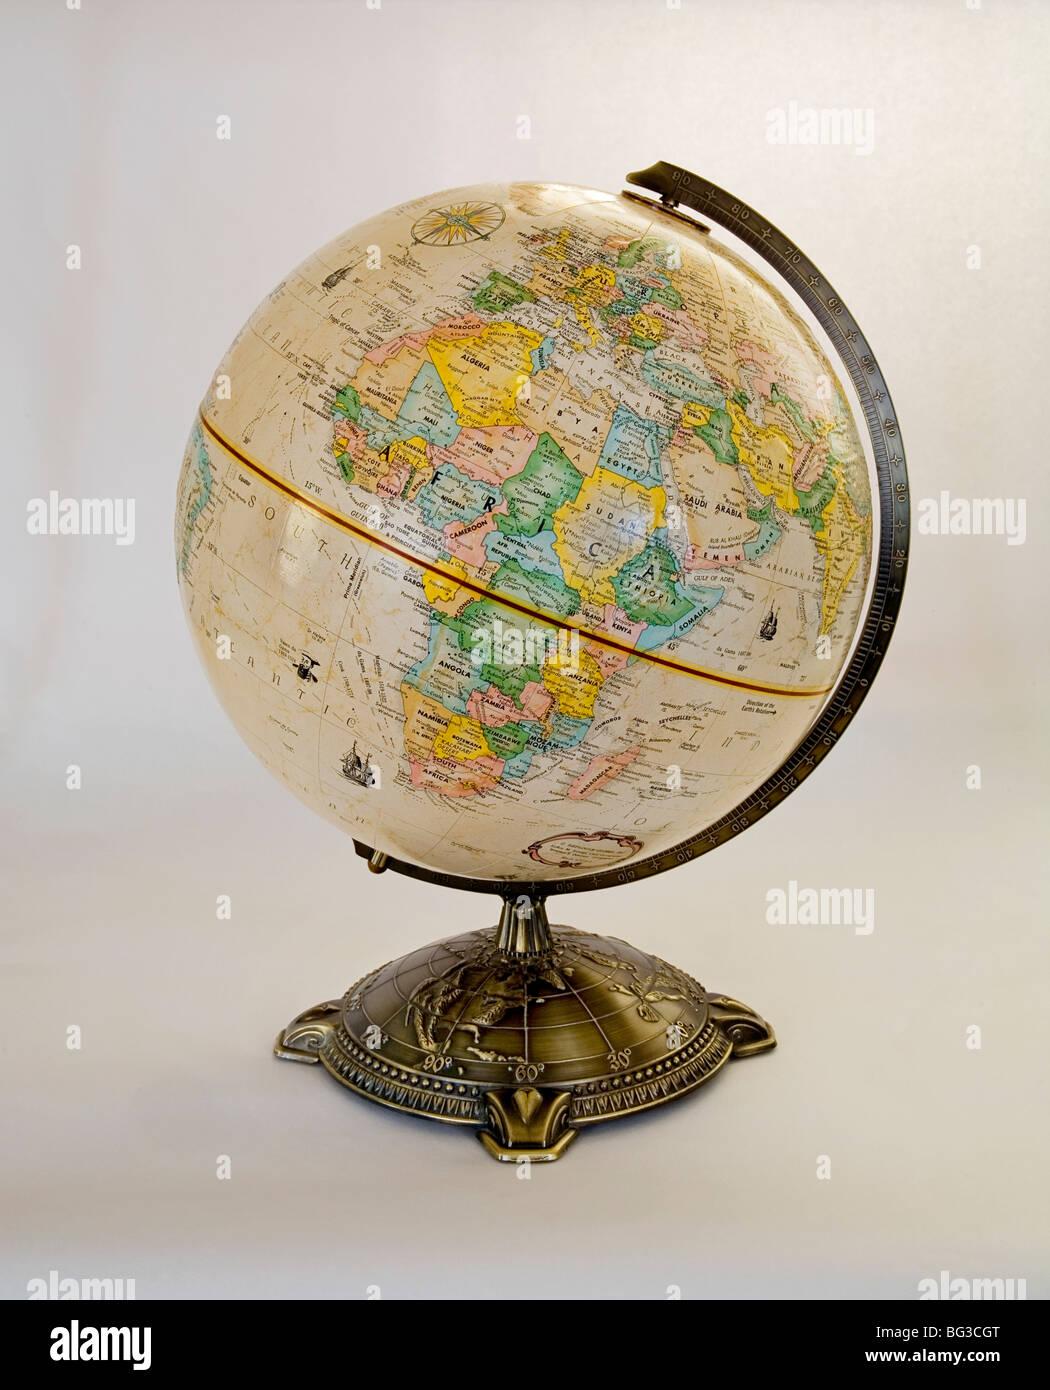 Globe Globe World Earth Map of the World - Stock Image